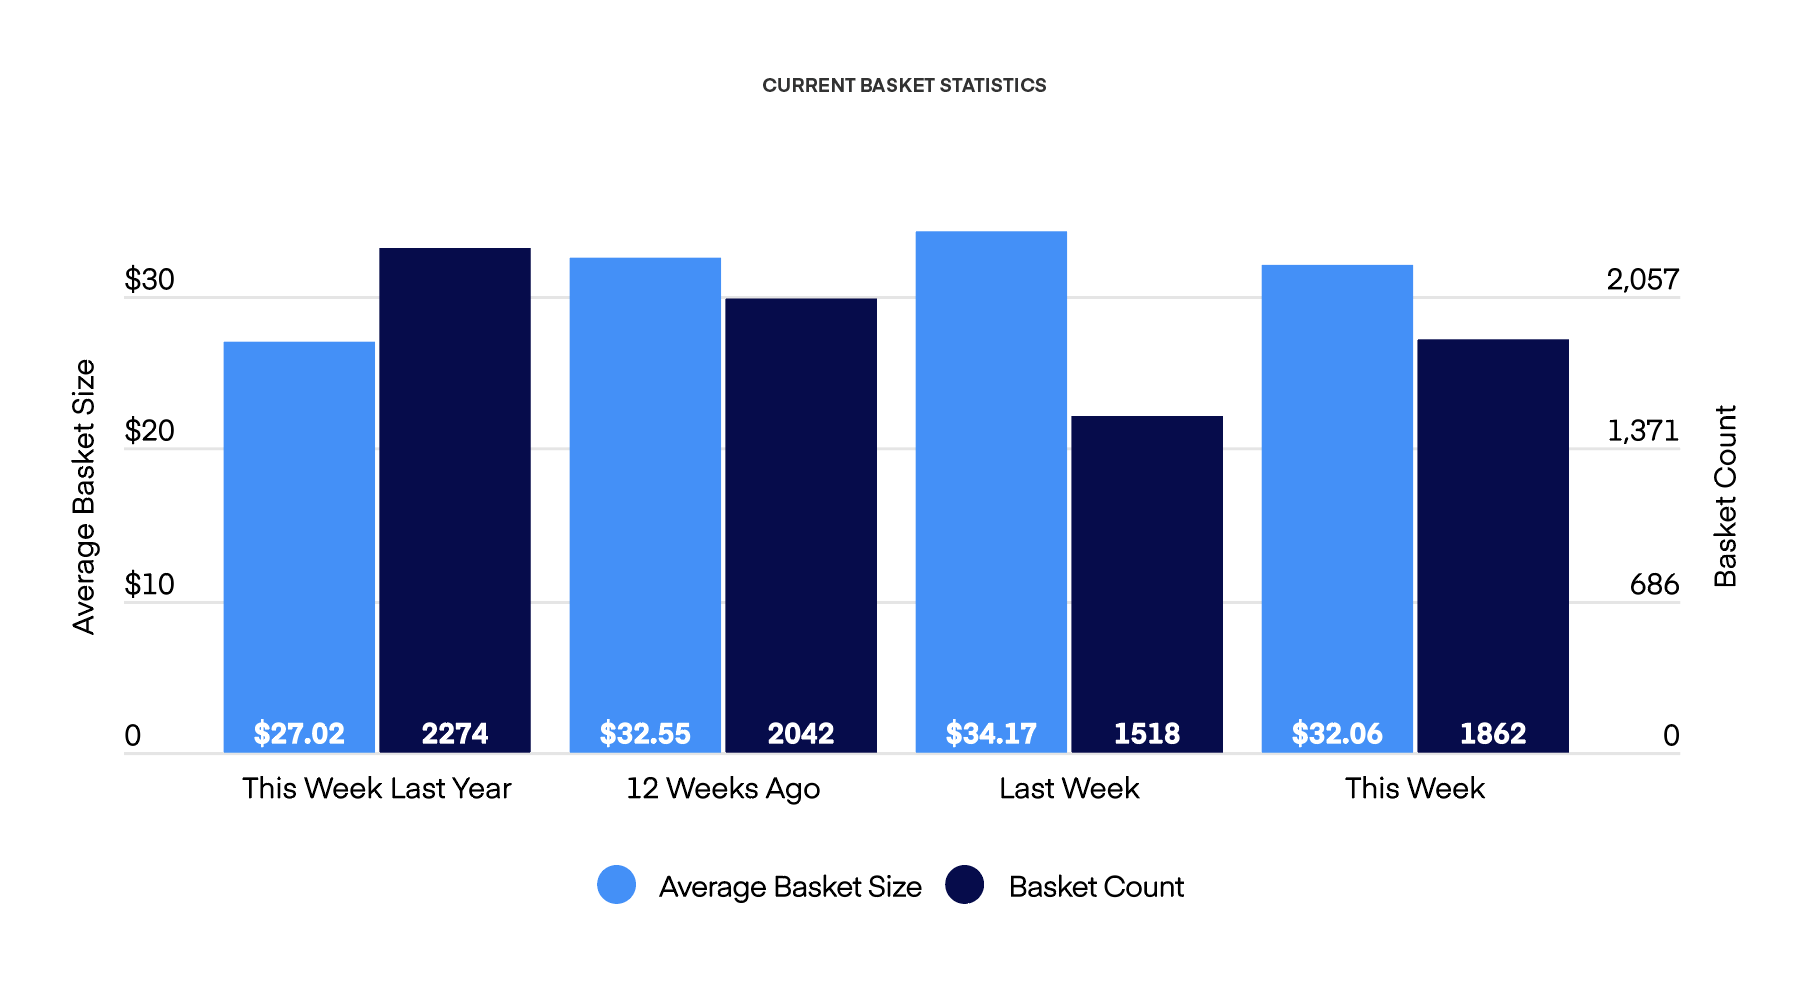 CURRENT BASKET STATISTICS